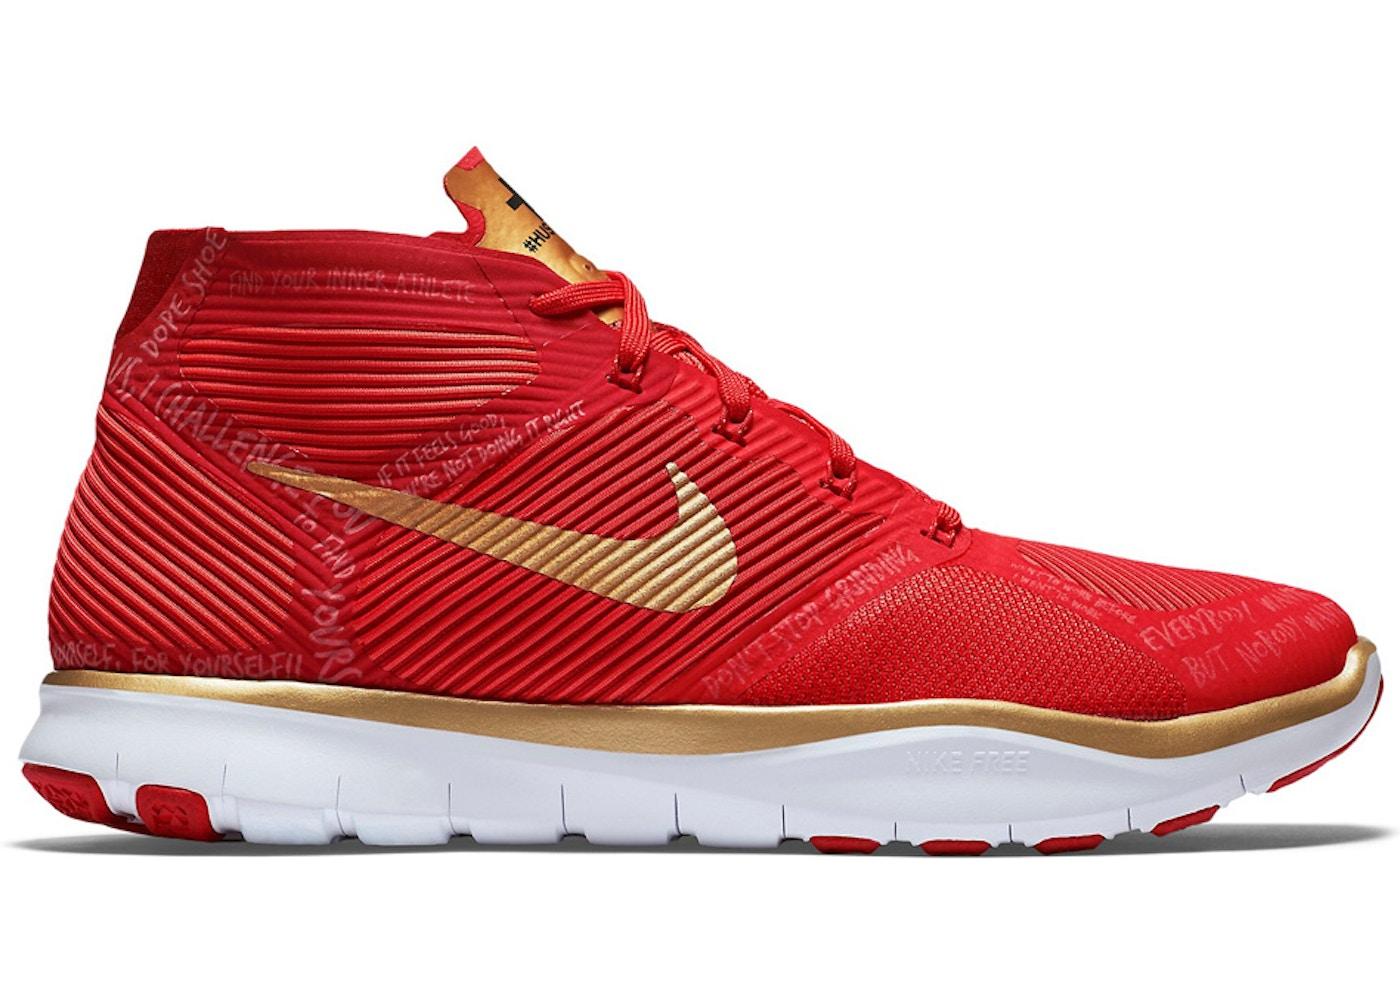 087ec02c8f164 Nike Free Train Instinct Hustle Hart Red - 848416-876